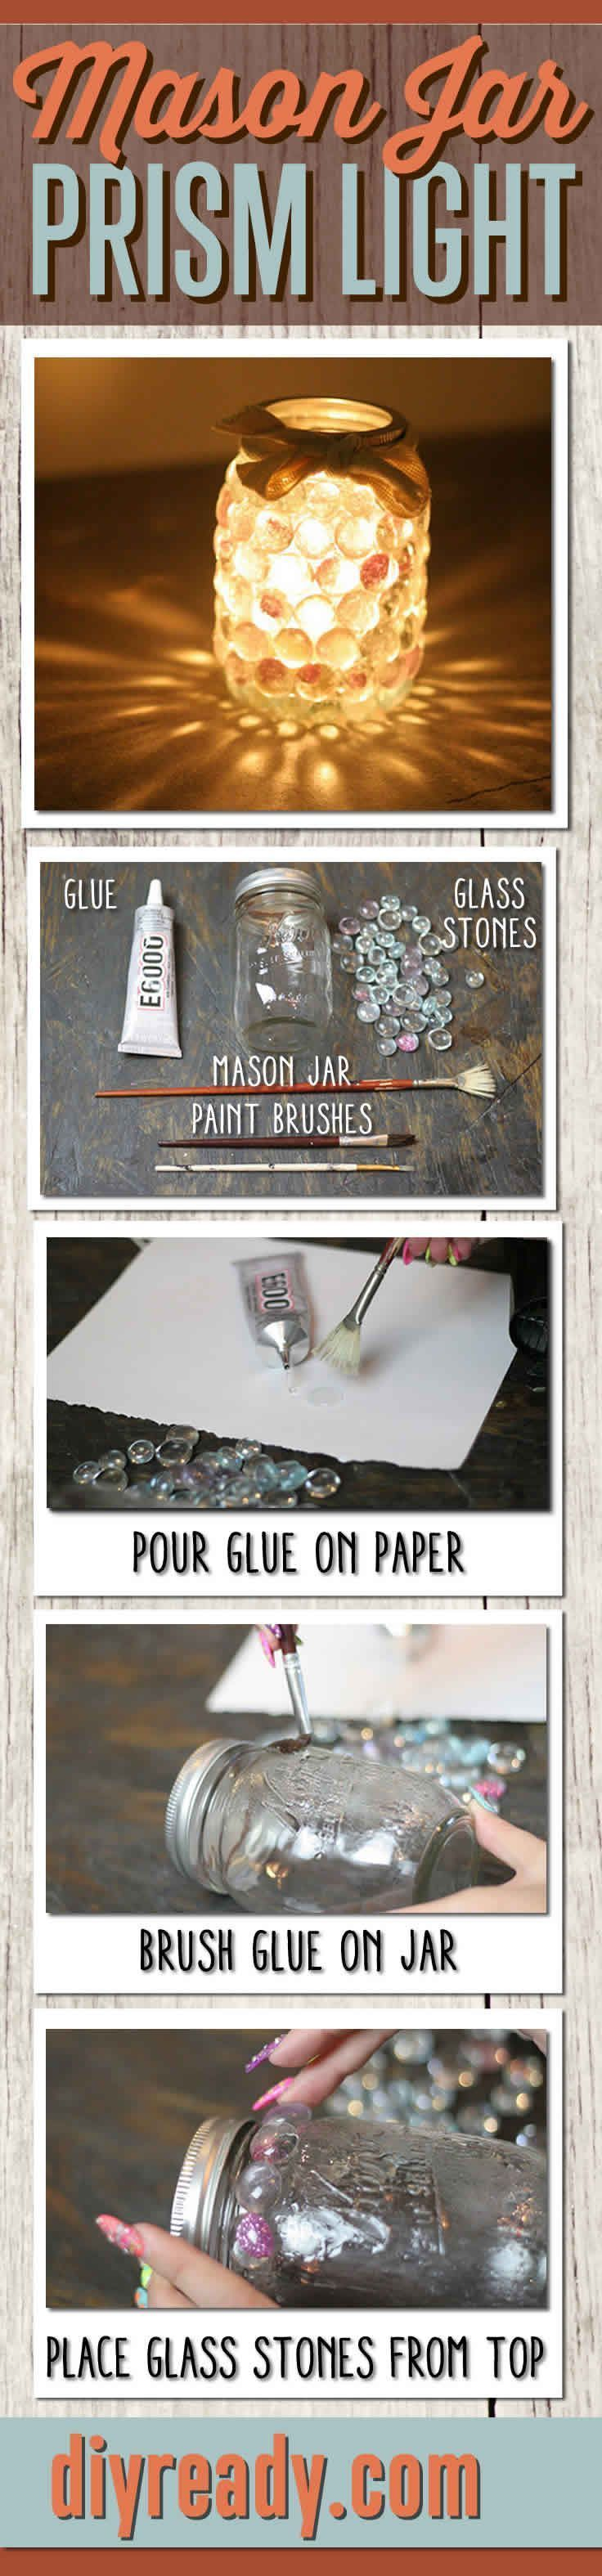 Mason Jar Crafts | Dollar Store Craft Ideas - Easy DIY Mason Jar Light Project